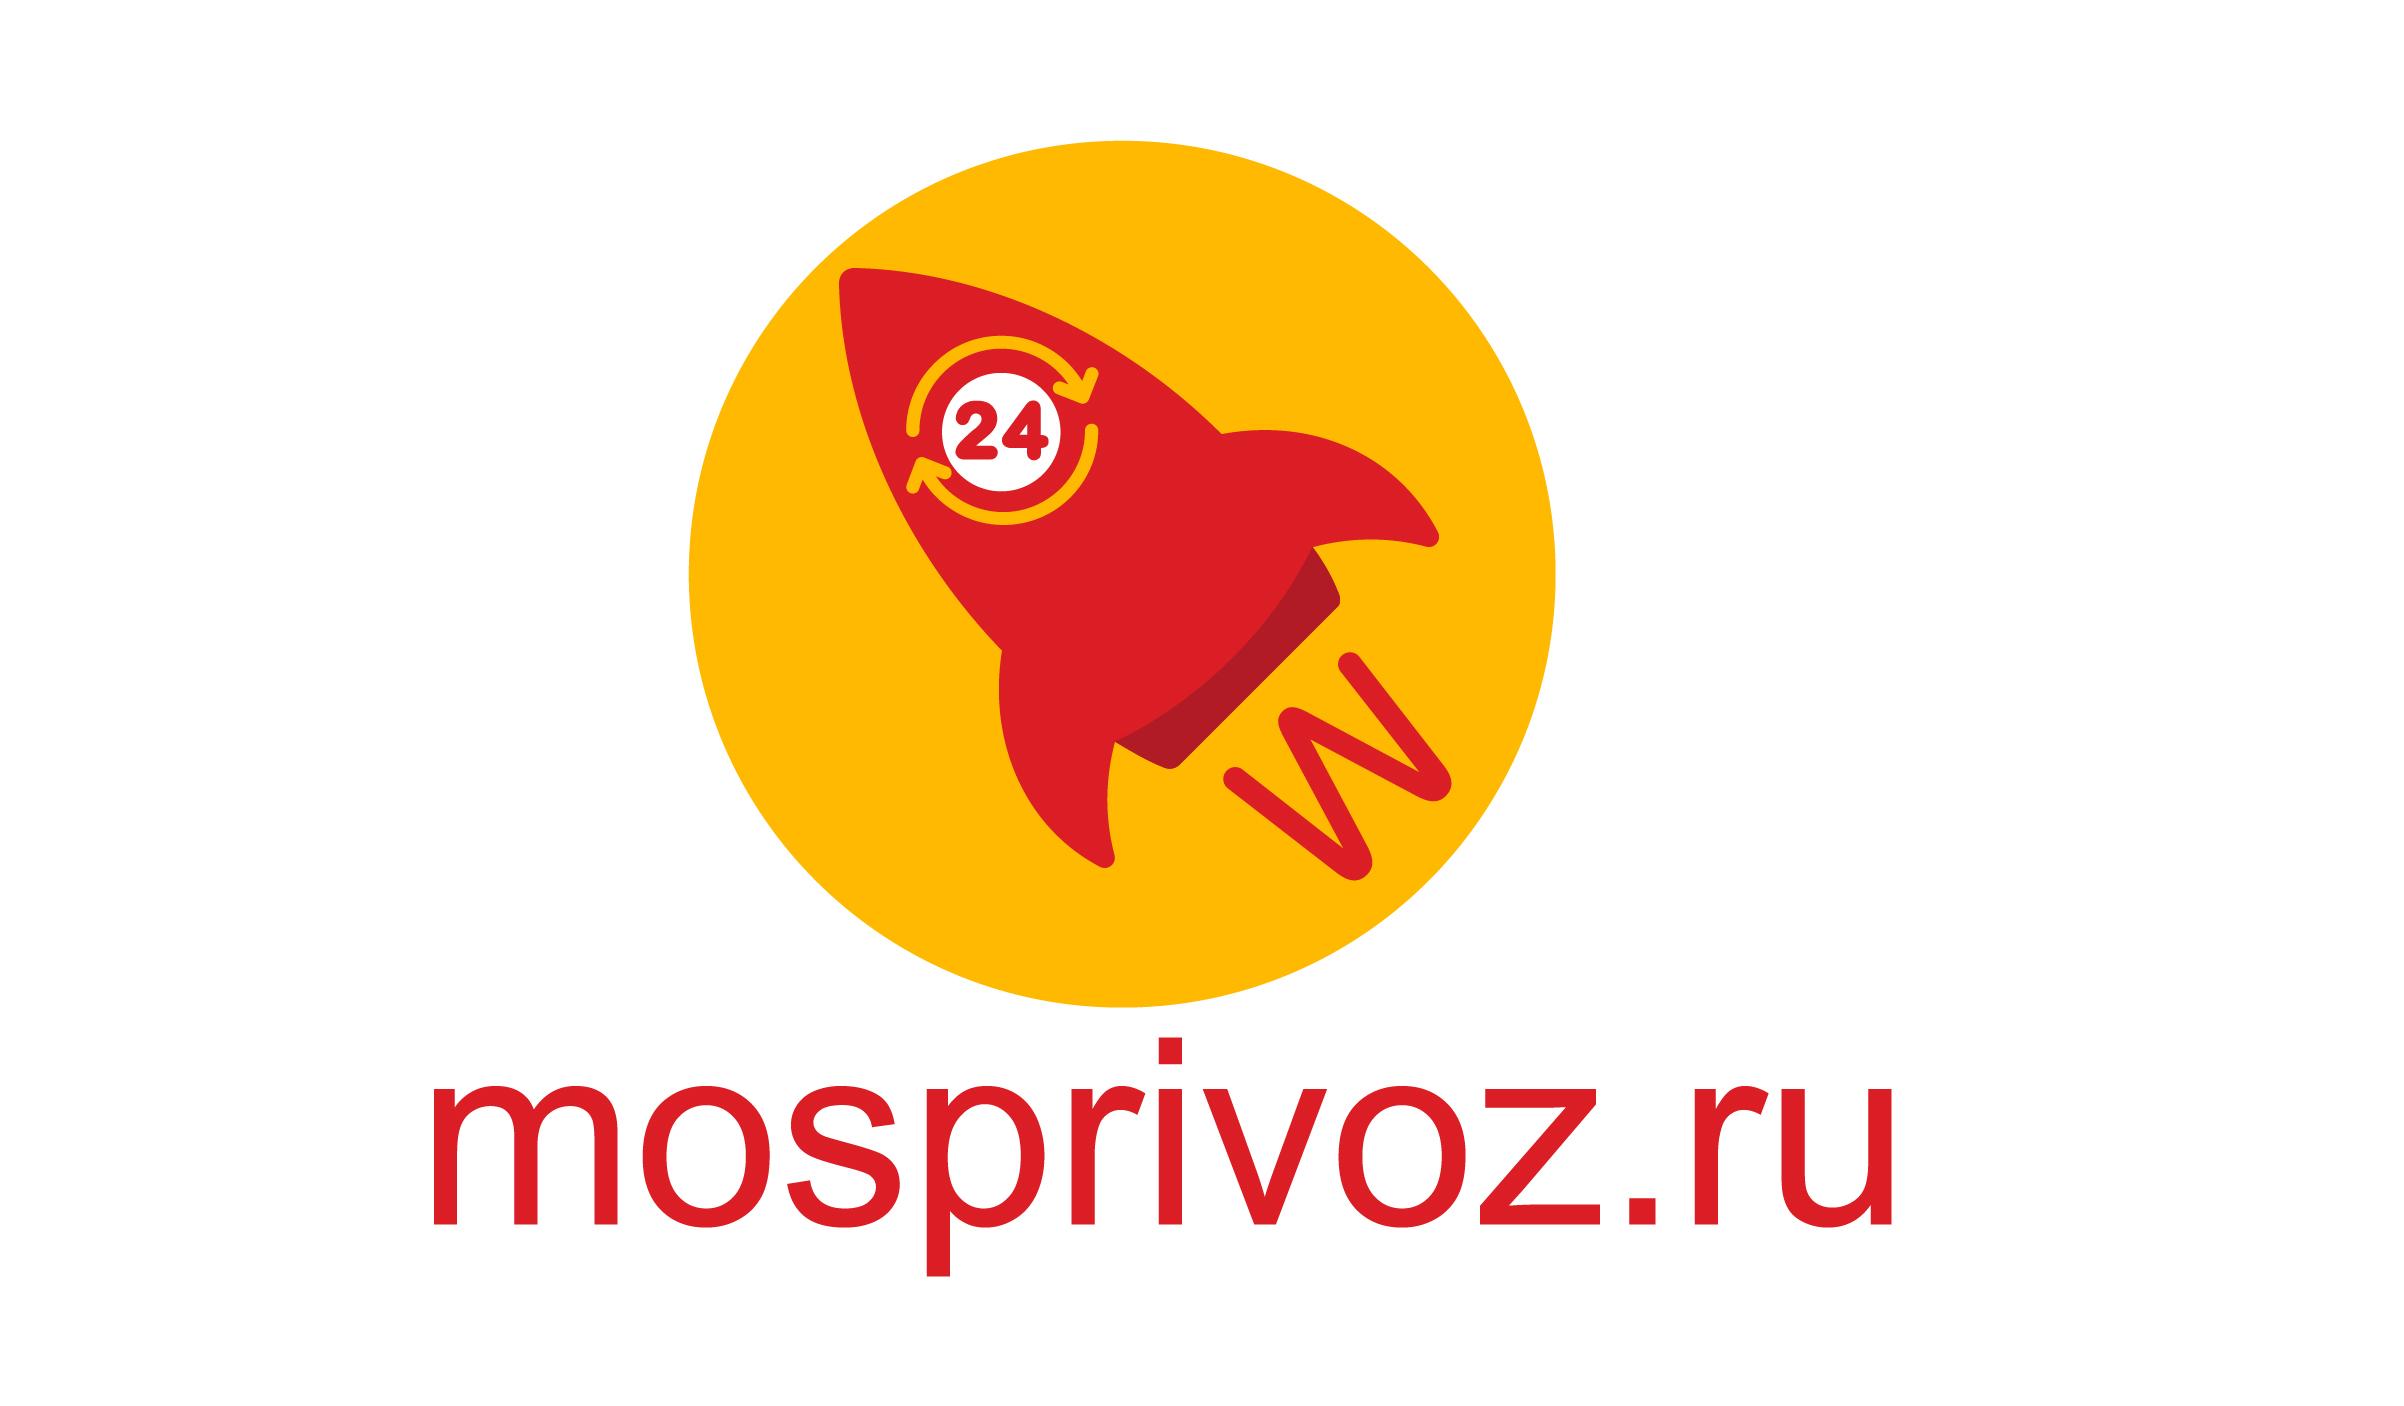 Логотип. Интернет - магазин по доставке продуктов питания. фото f_6245ada3e7badb66.jpg